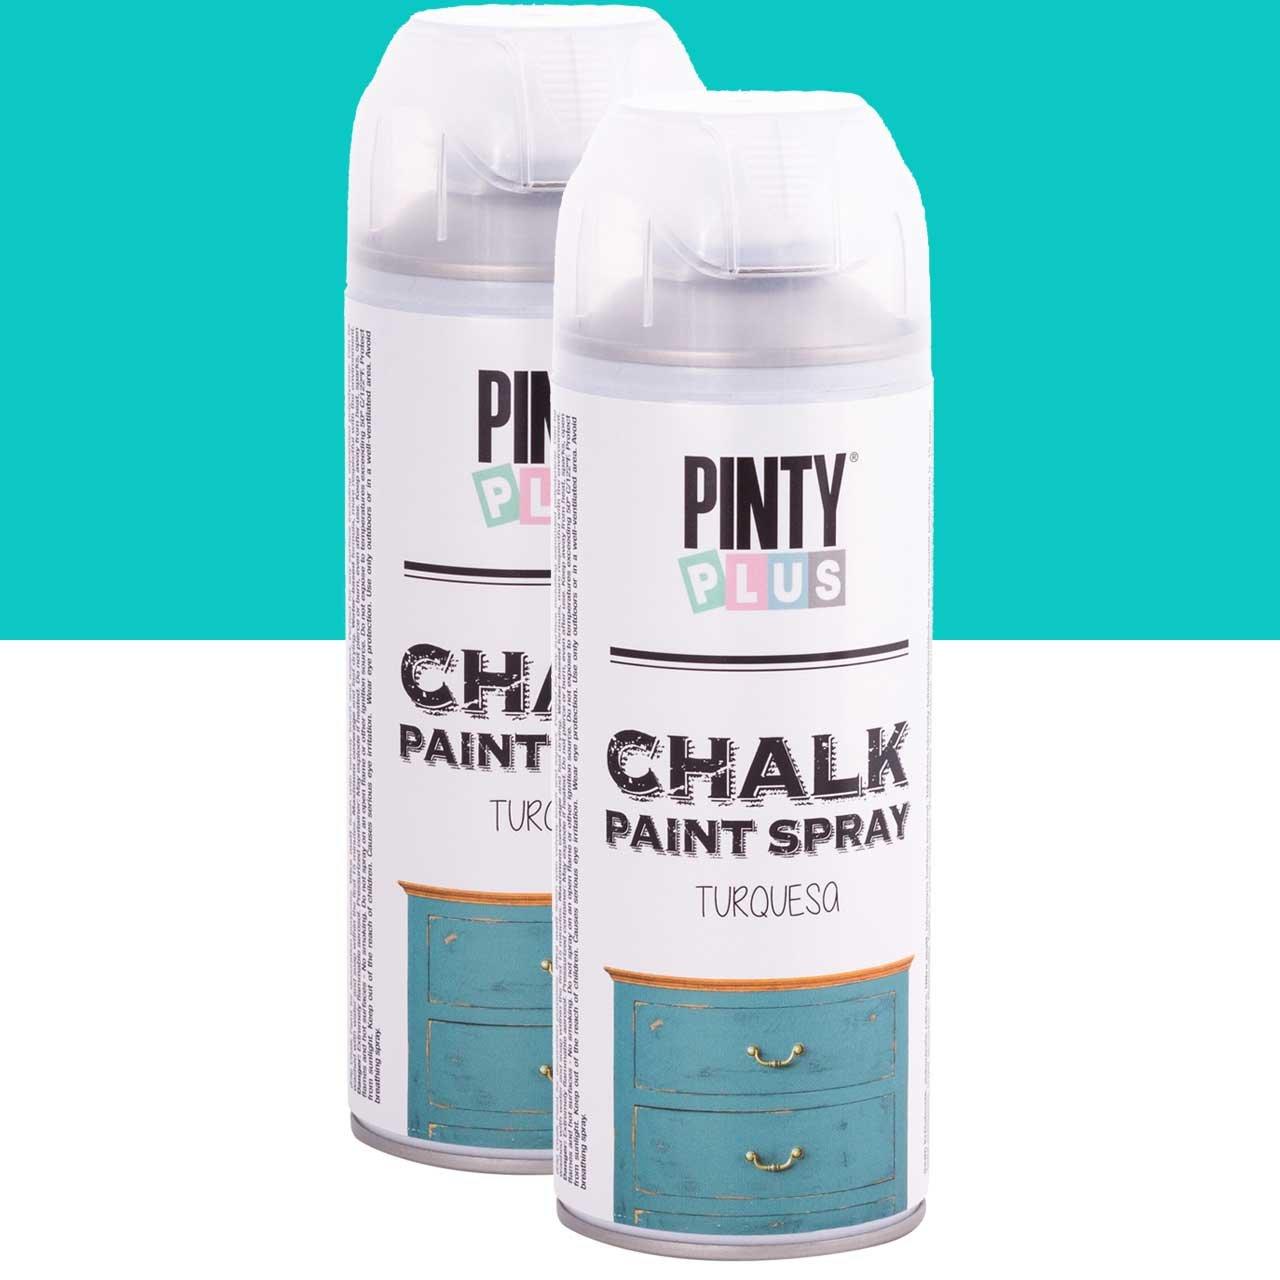 CHALK FINISH SPRAY PAINT, PINTYPLUS, 400 ml, Assorted Colors-Sizes ...